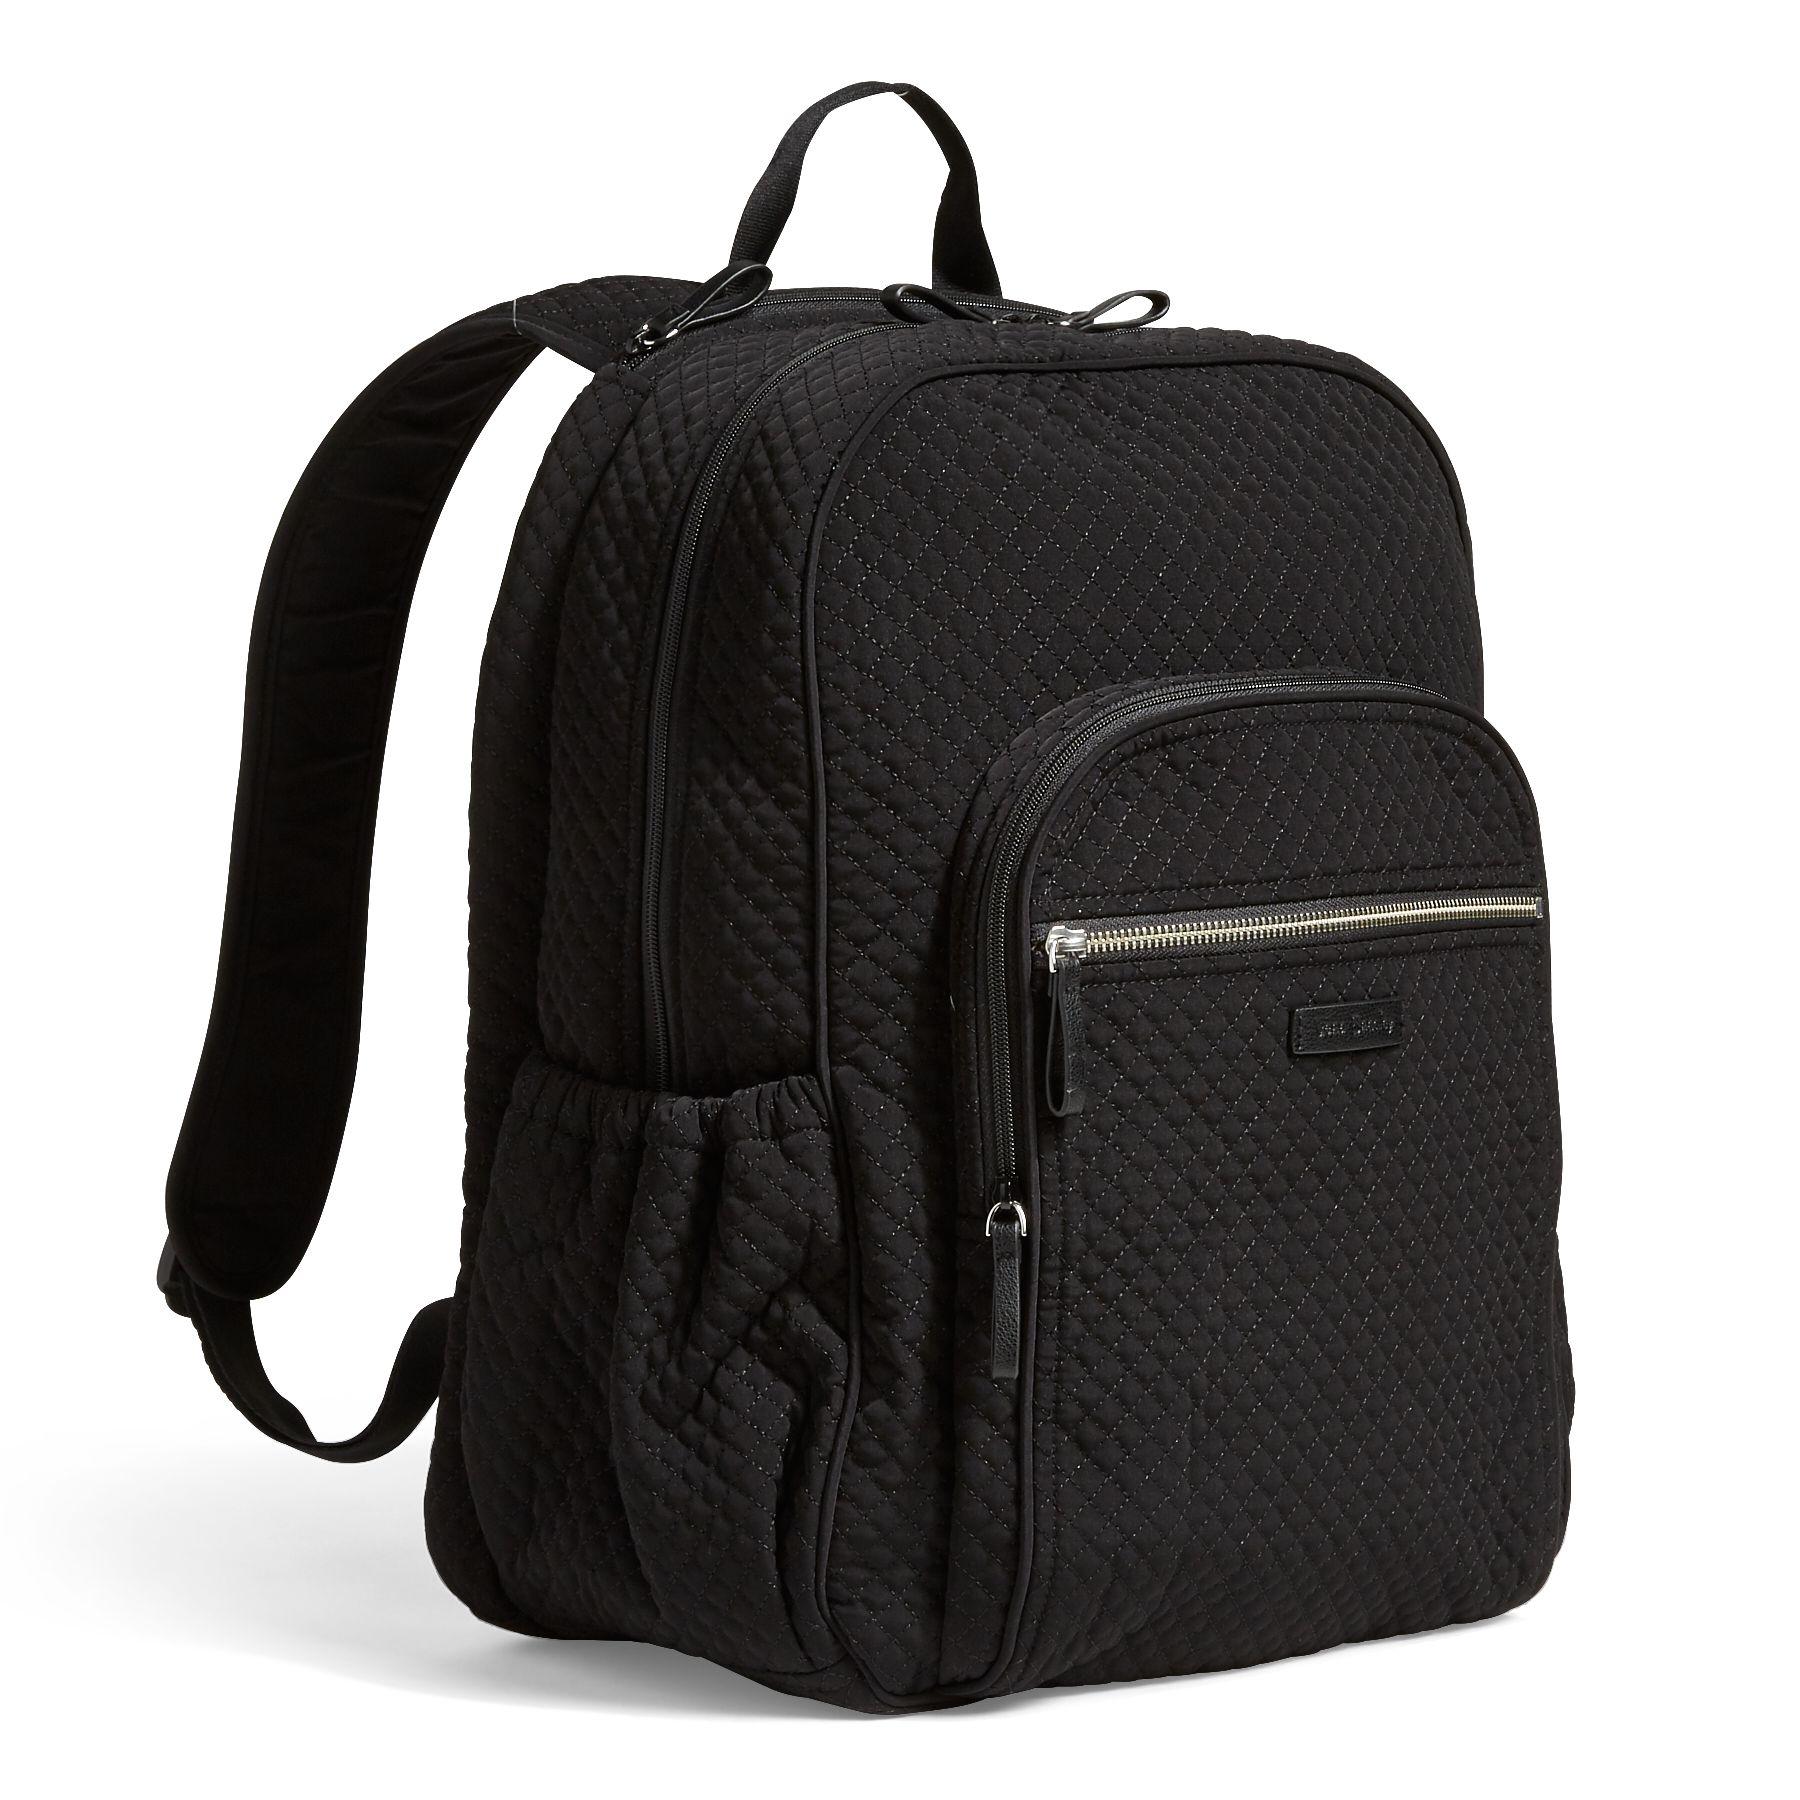 52f1cae478e Iconic Campus Backpack   Vera Bradley